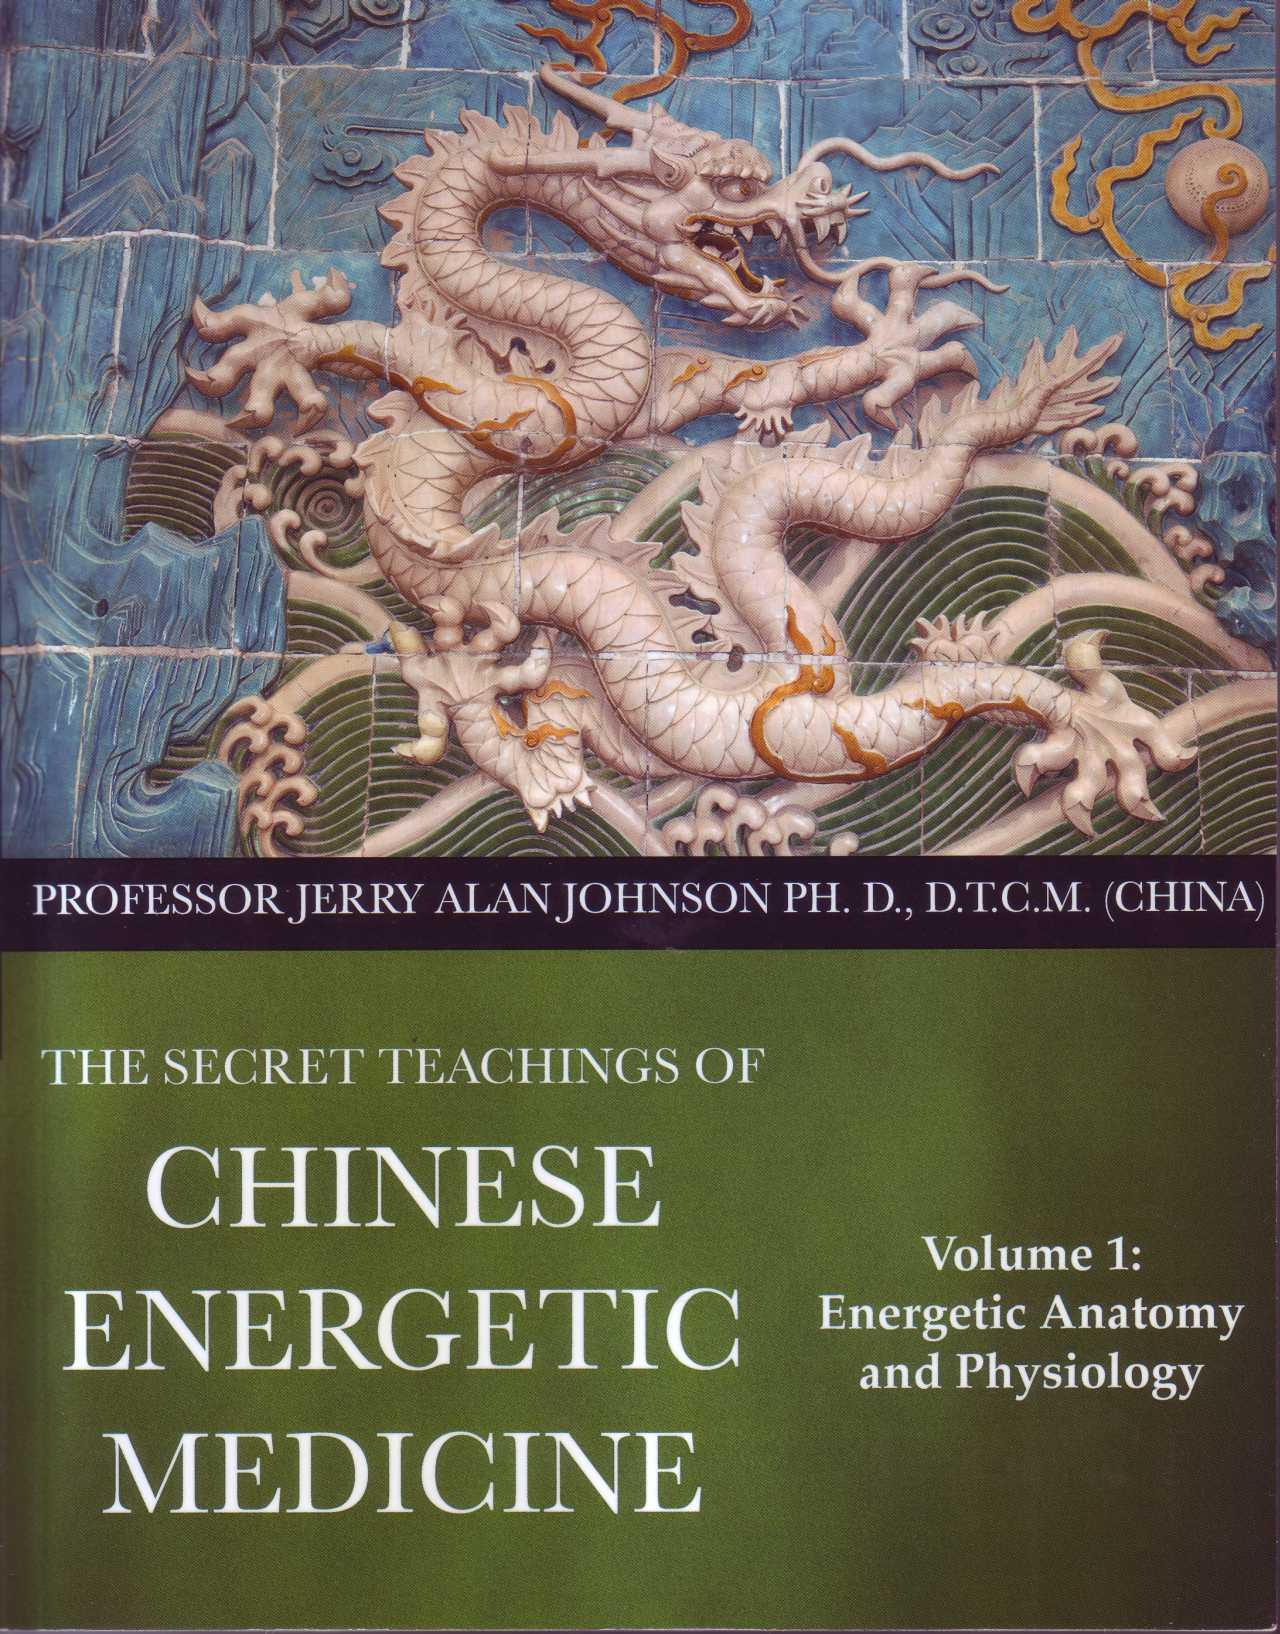 Secret Teachings of Chinese Qigong Therapy - Vol 1 - AcuMedic Shop